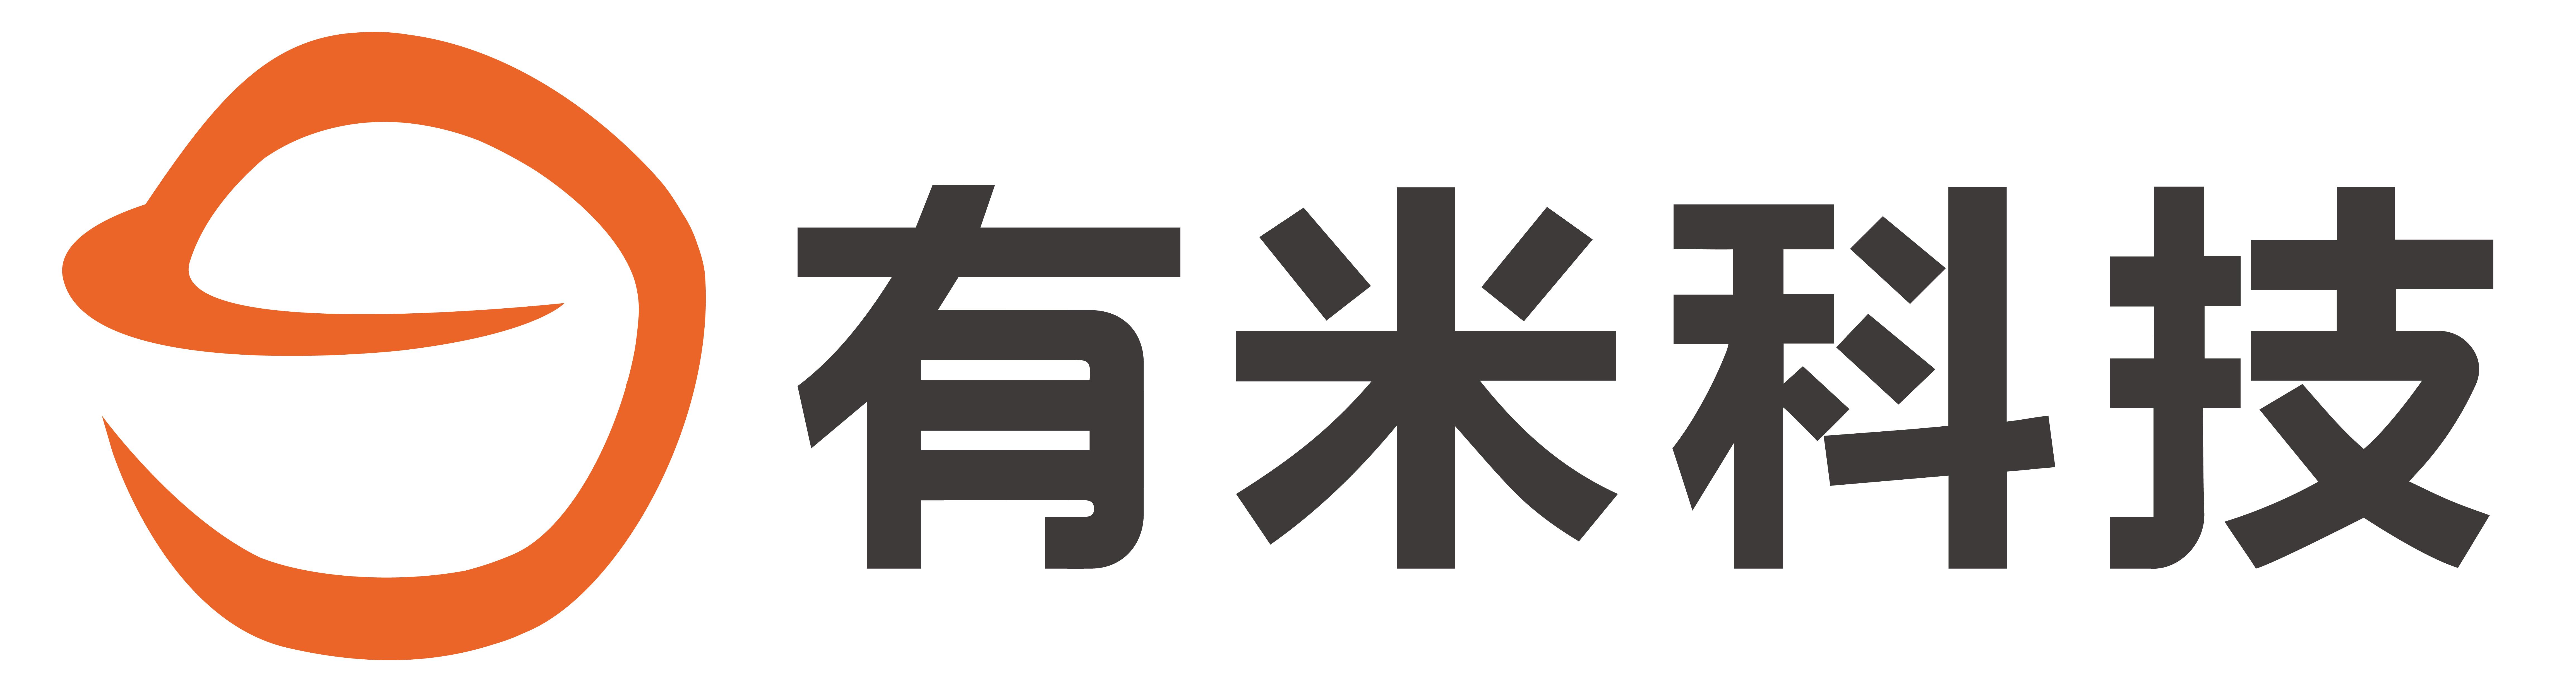 logo logo 标识 标志 设计 矢量 矢量图 素材 图标 9231_2480